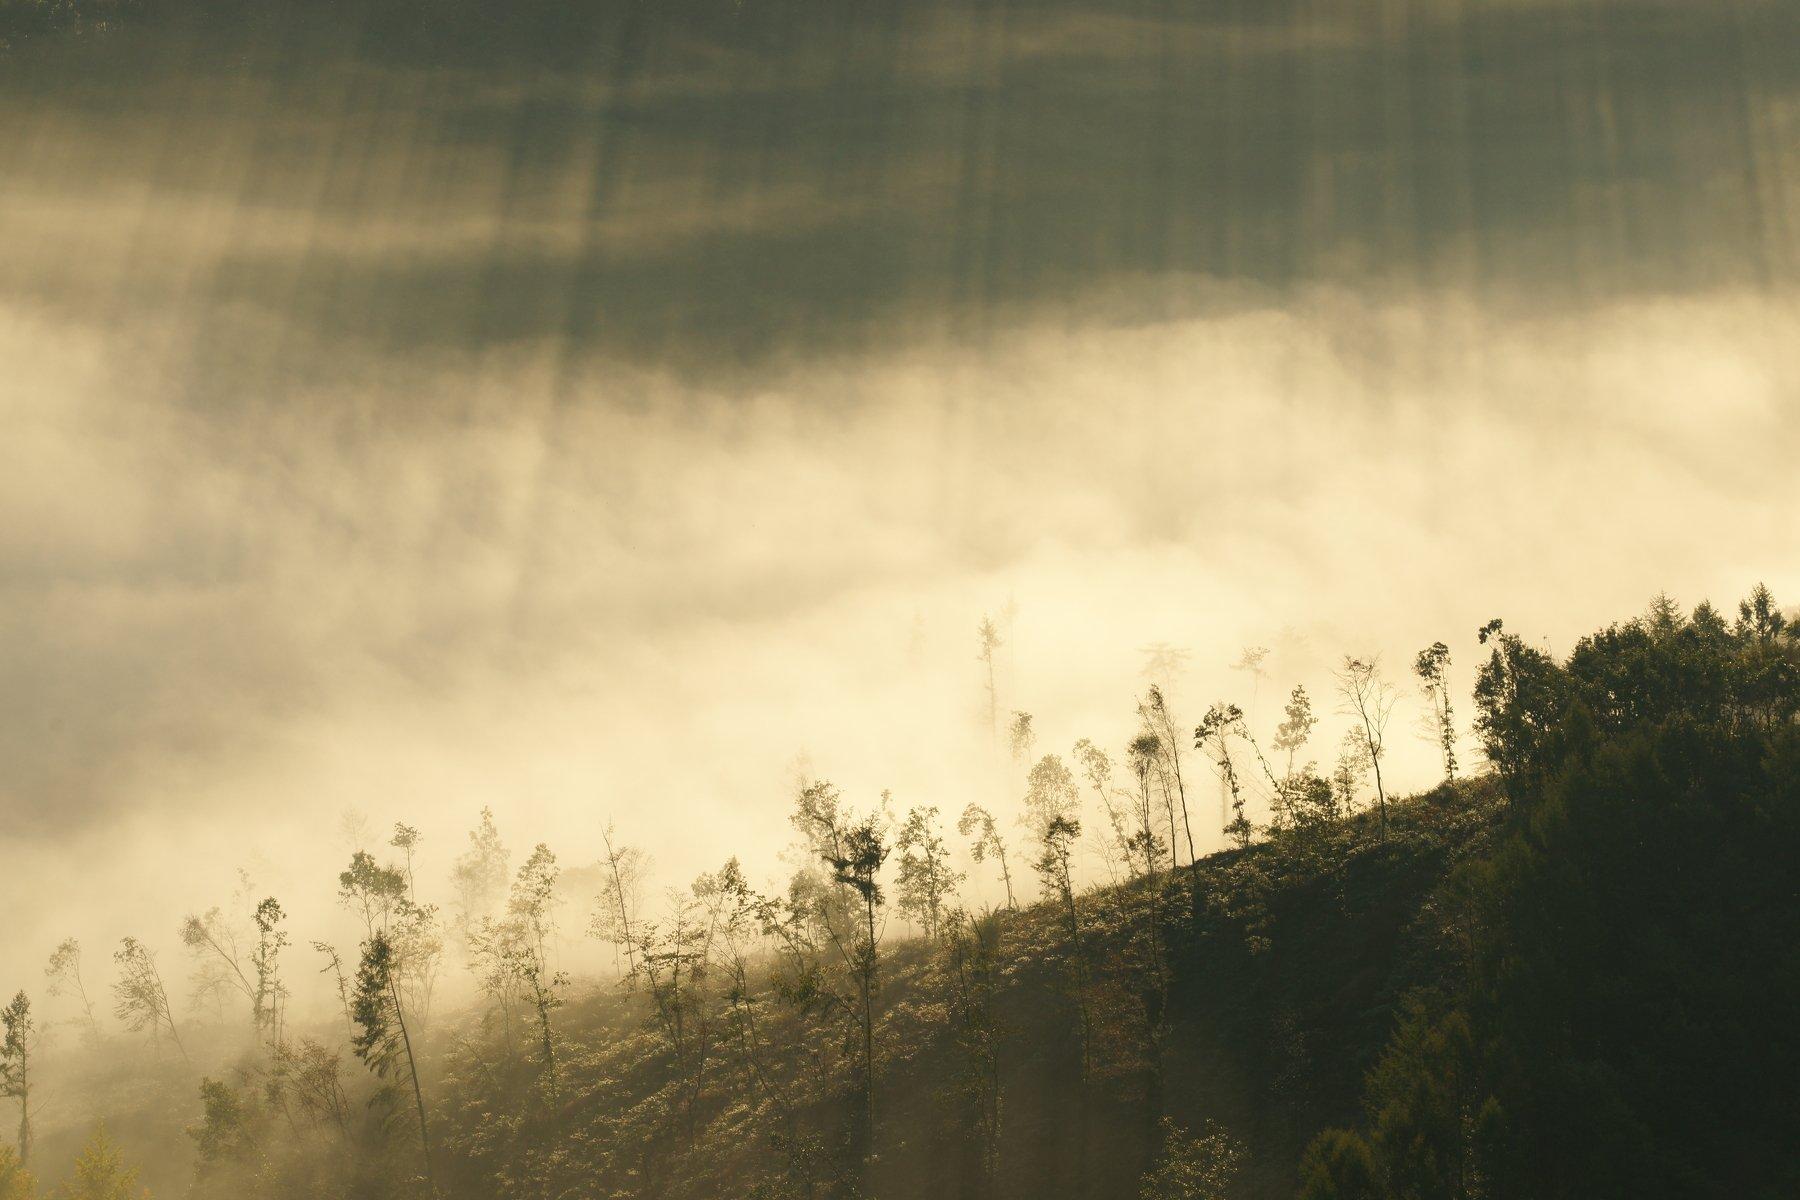 asia,korea,south korea,mountain,fog,light,trees,morning,nature,landscape, Shin